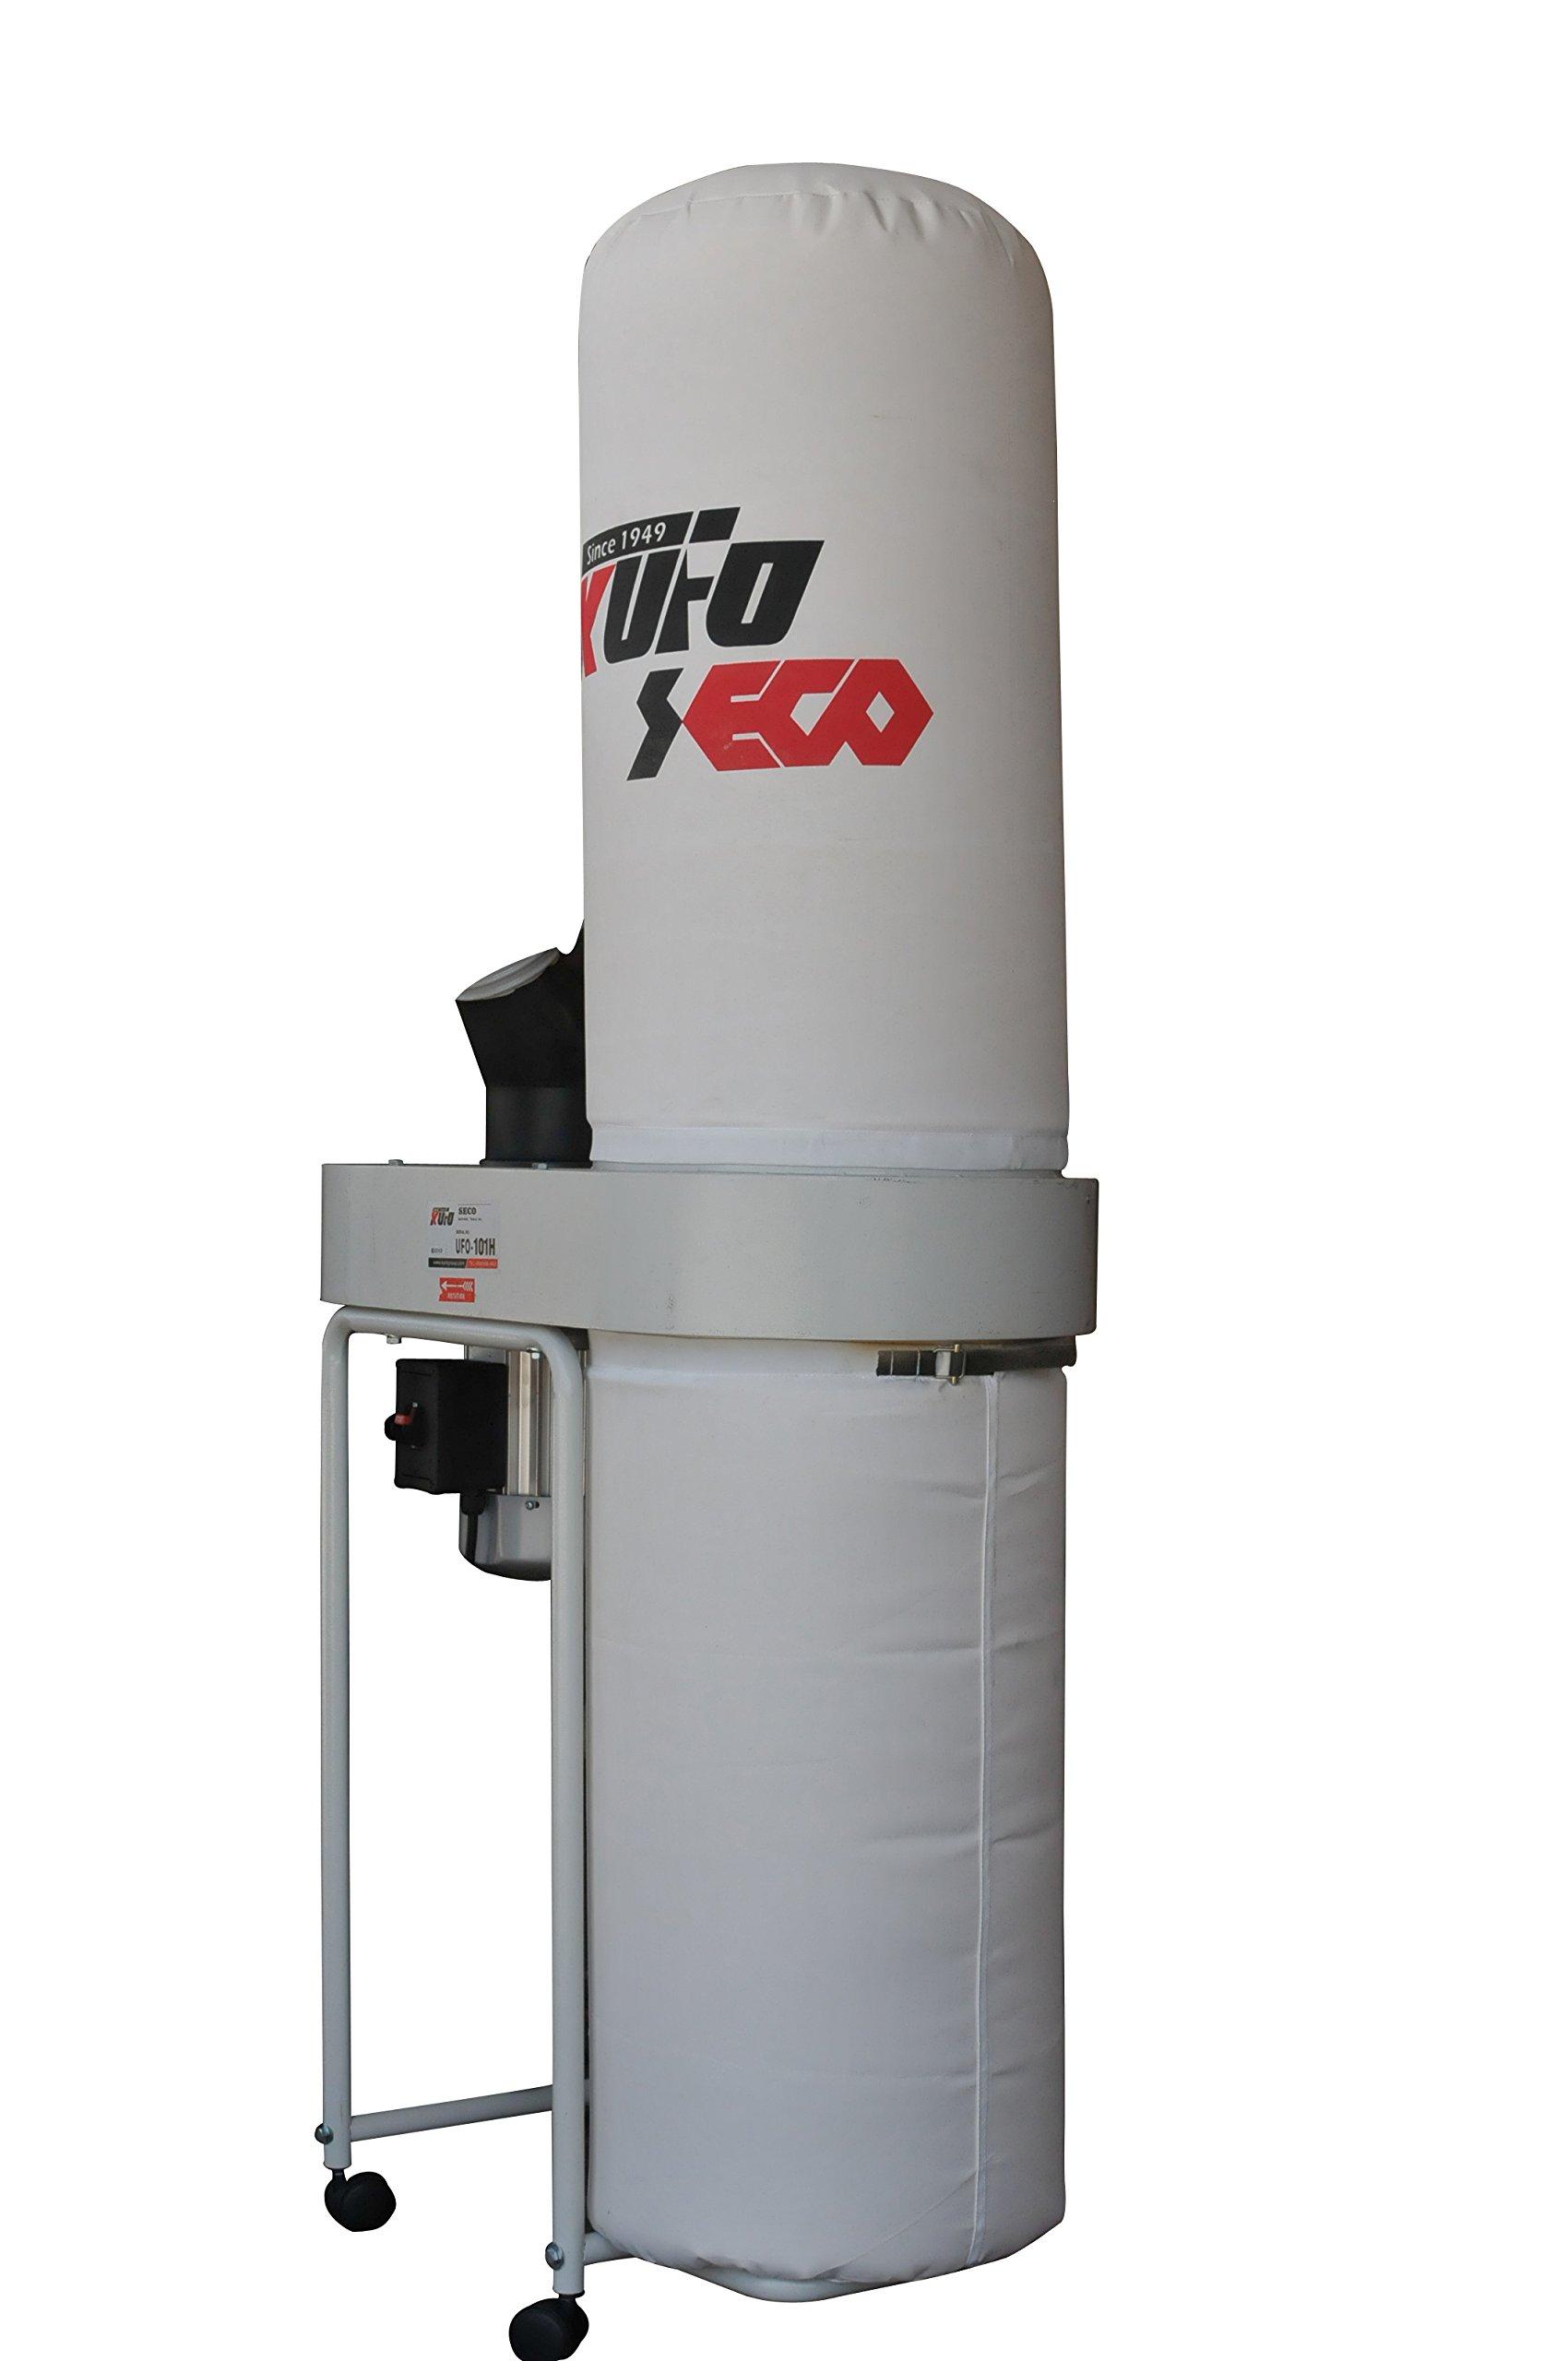 Kufo Seco UFO-101H3, 2HP, 3phase 220/440V (prewired 220V) 1550 CFM Vertical Bag Dust Collector